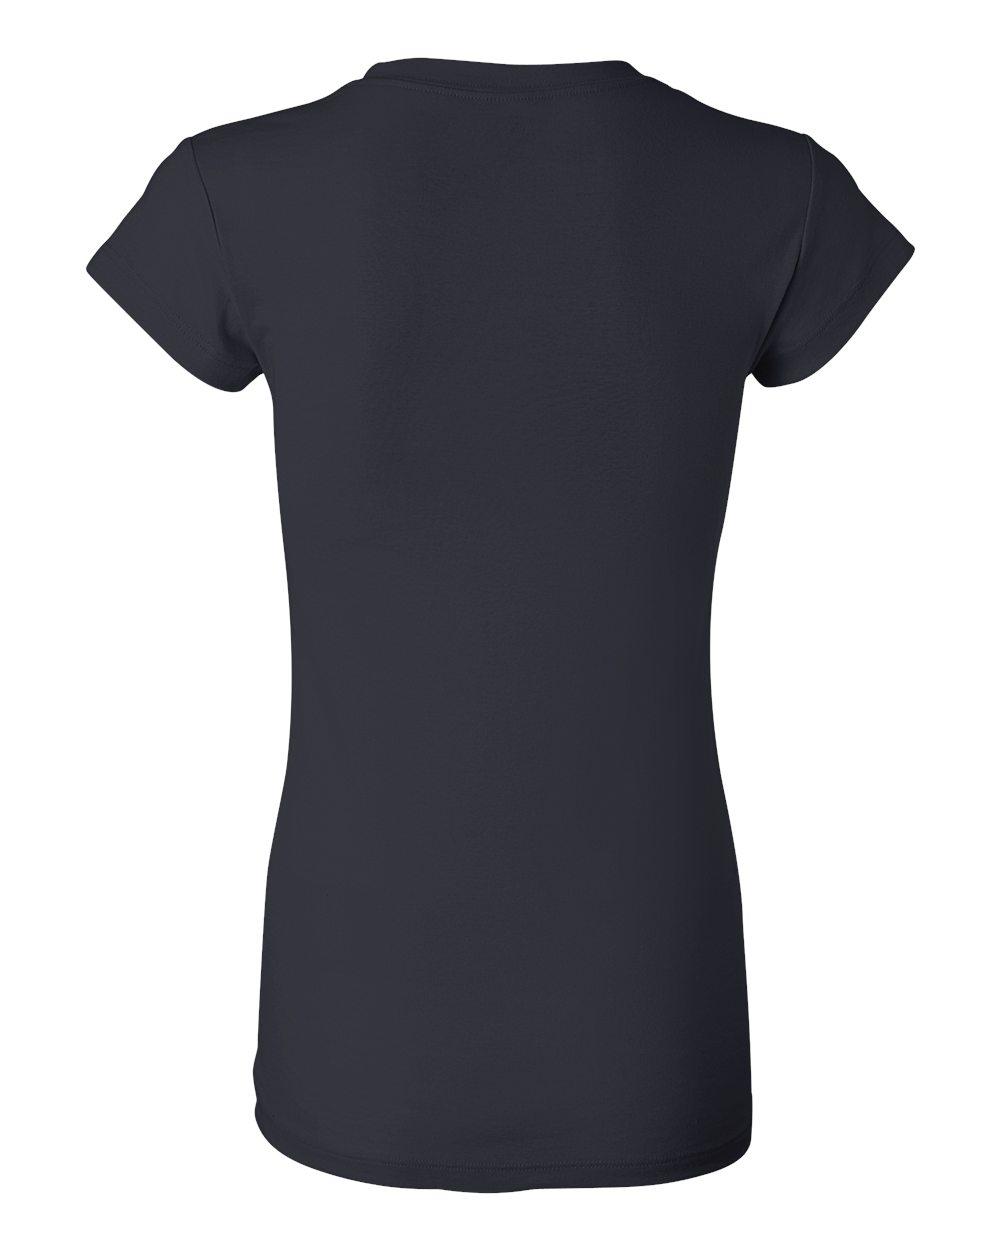 Bella-Canvas-Women-039-s-Sheer-Mini-Rib-Short-Sleeve-T-Shirt-8701-S-2XL thumbnail 22